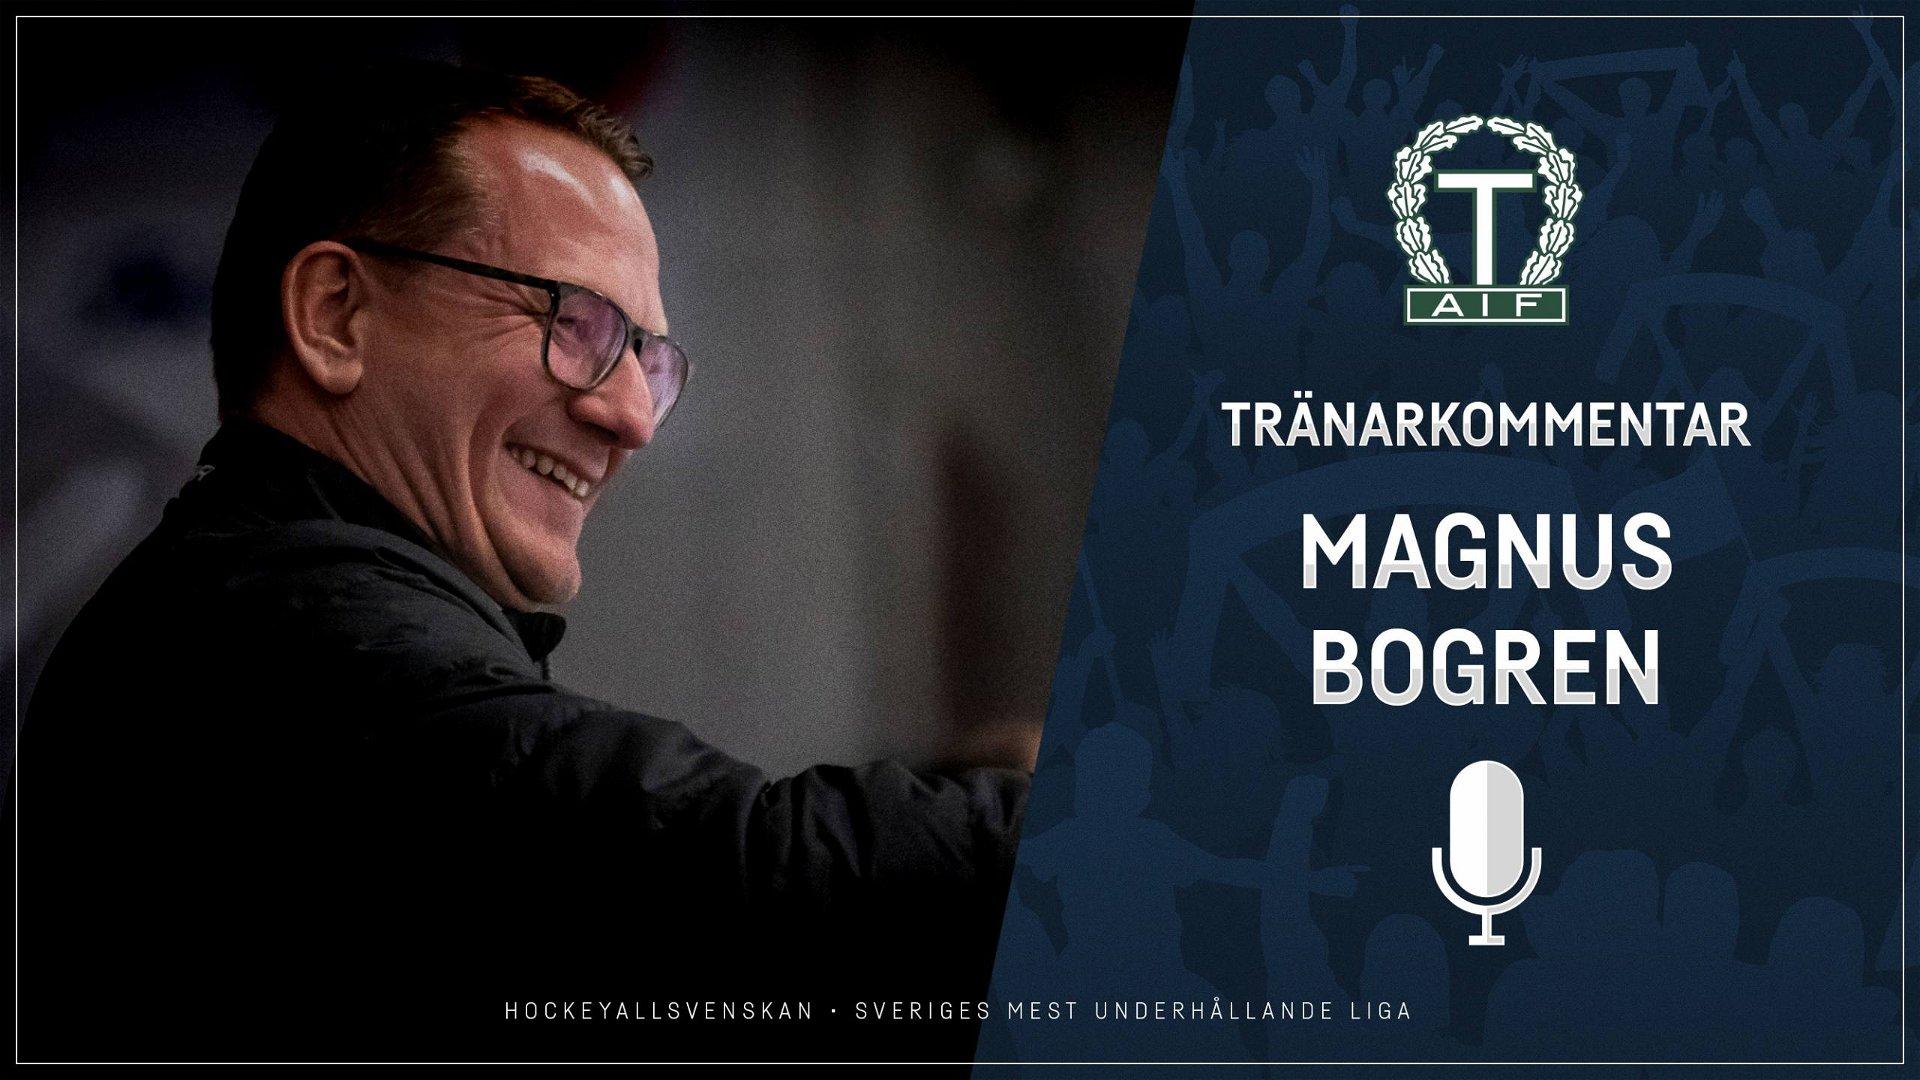 2020-10-16 Segerintervju: Magnus Bogren, Tingsryd